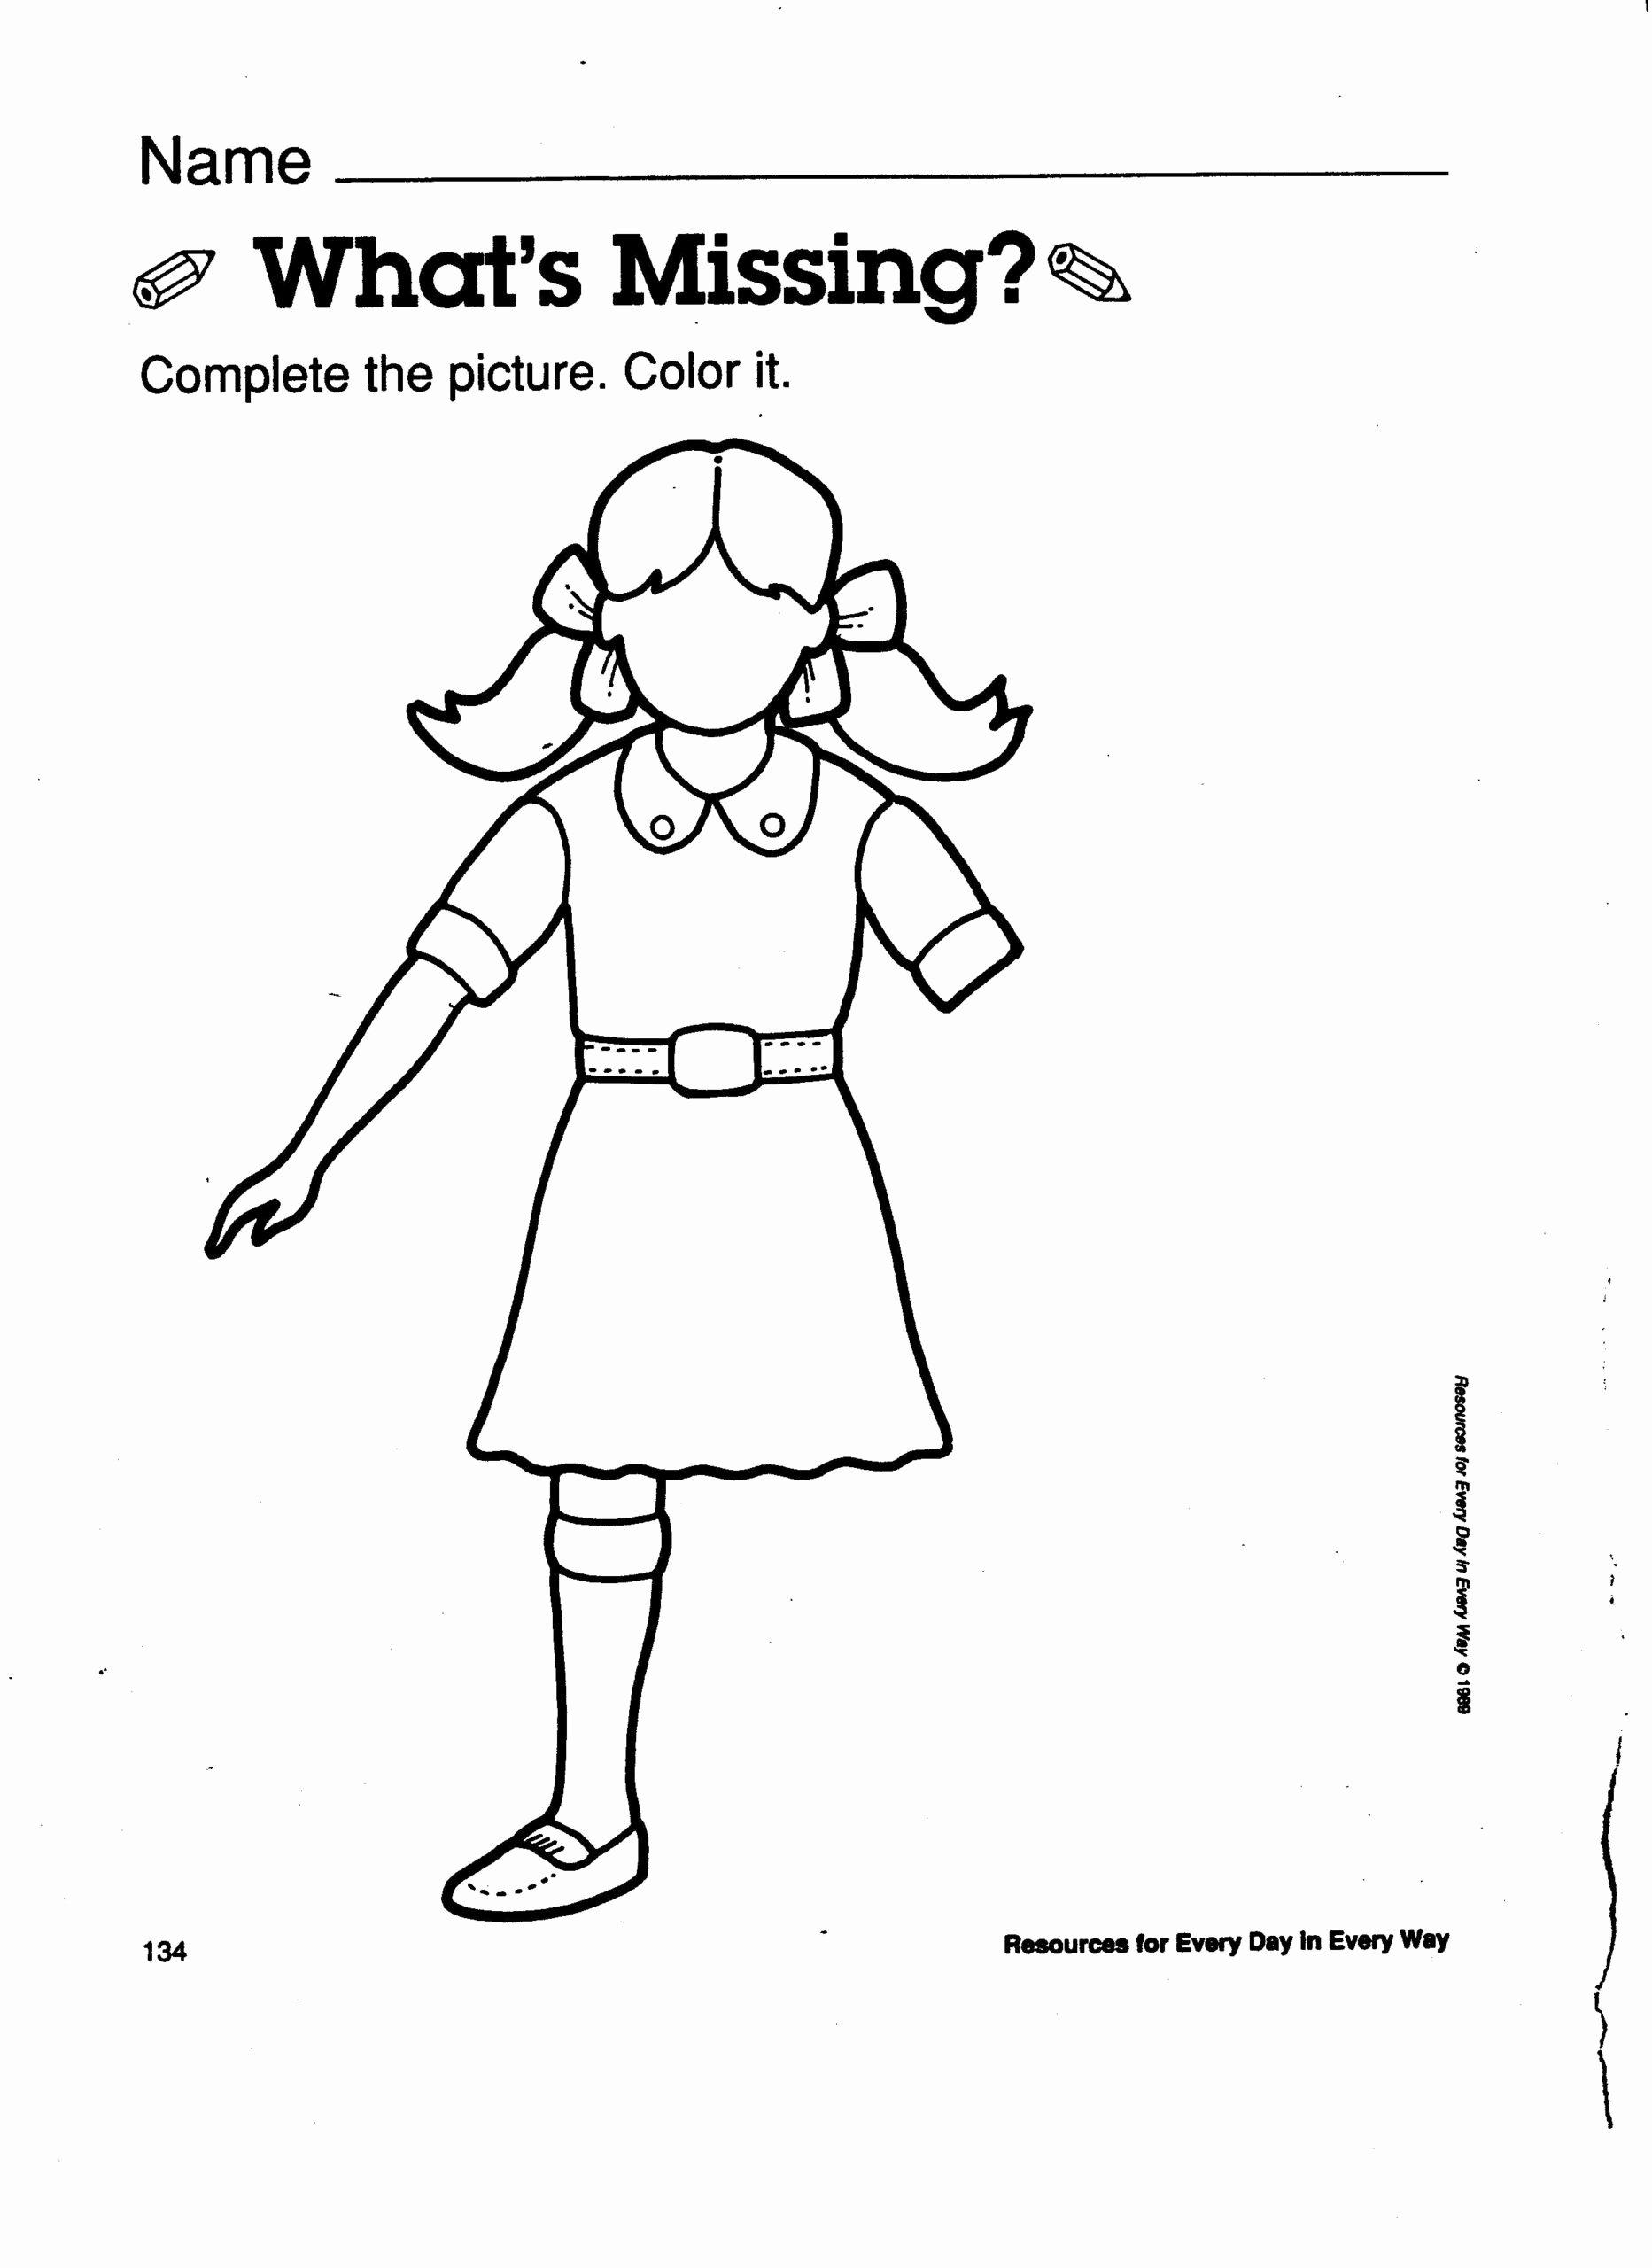 Body Worksheets for Preschoolers top Ermitavinyetsitges Page 6 Worksheet Preschool Human Body